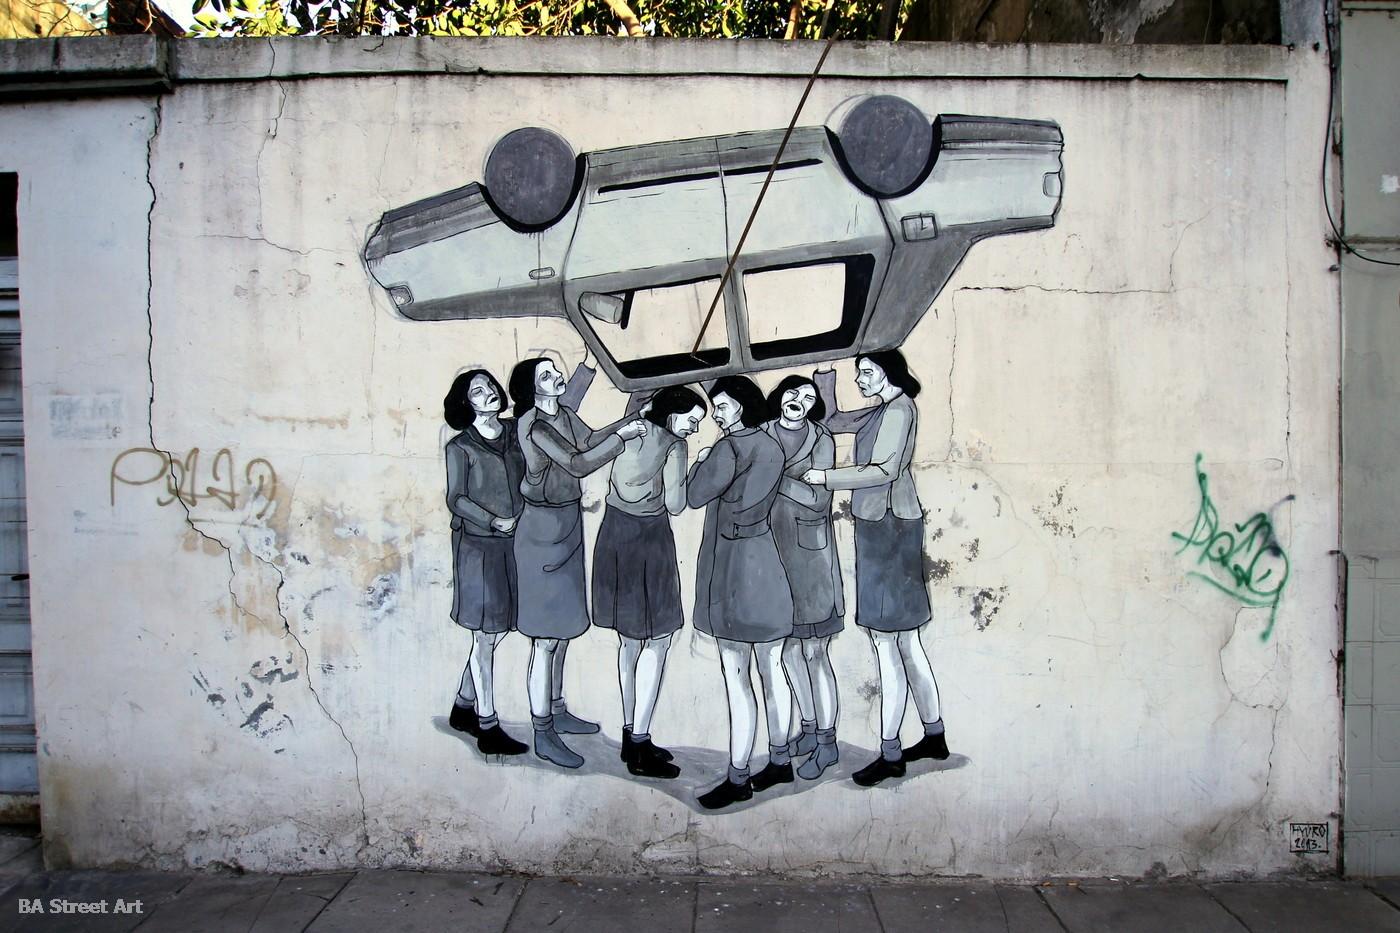 hyuro mural buenos aires argentina street artist tamara djurovic